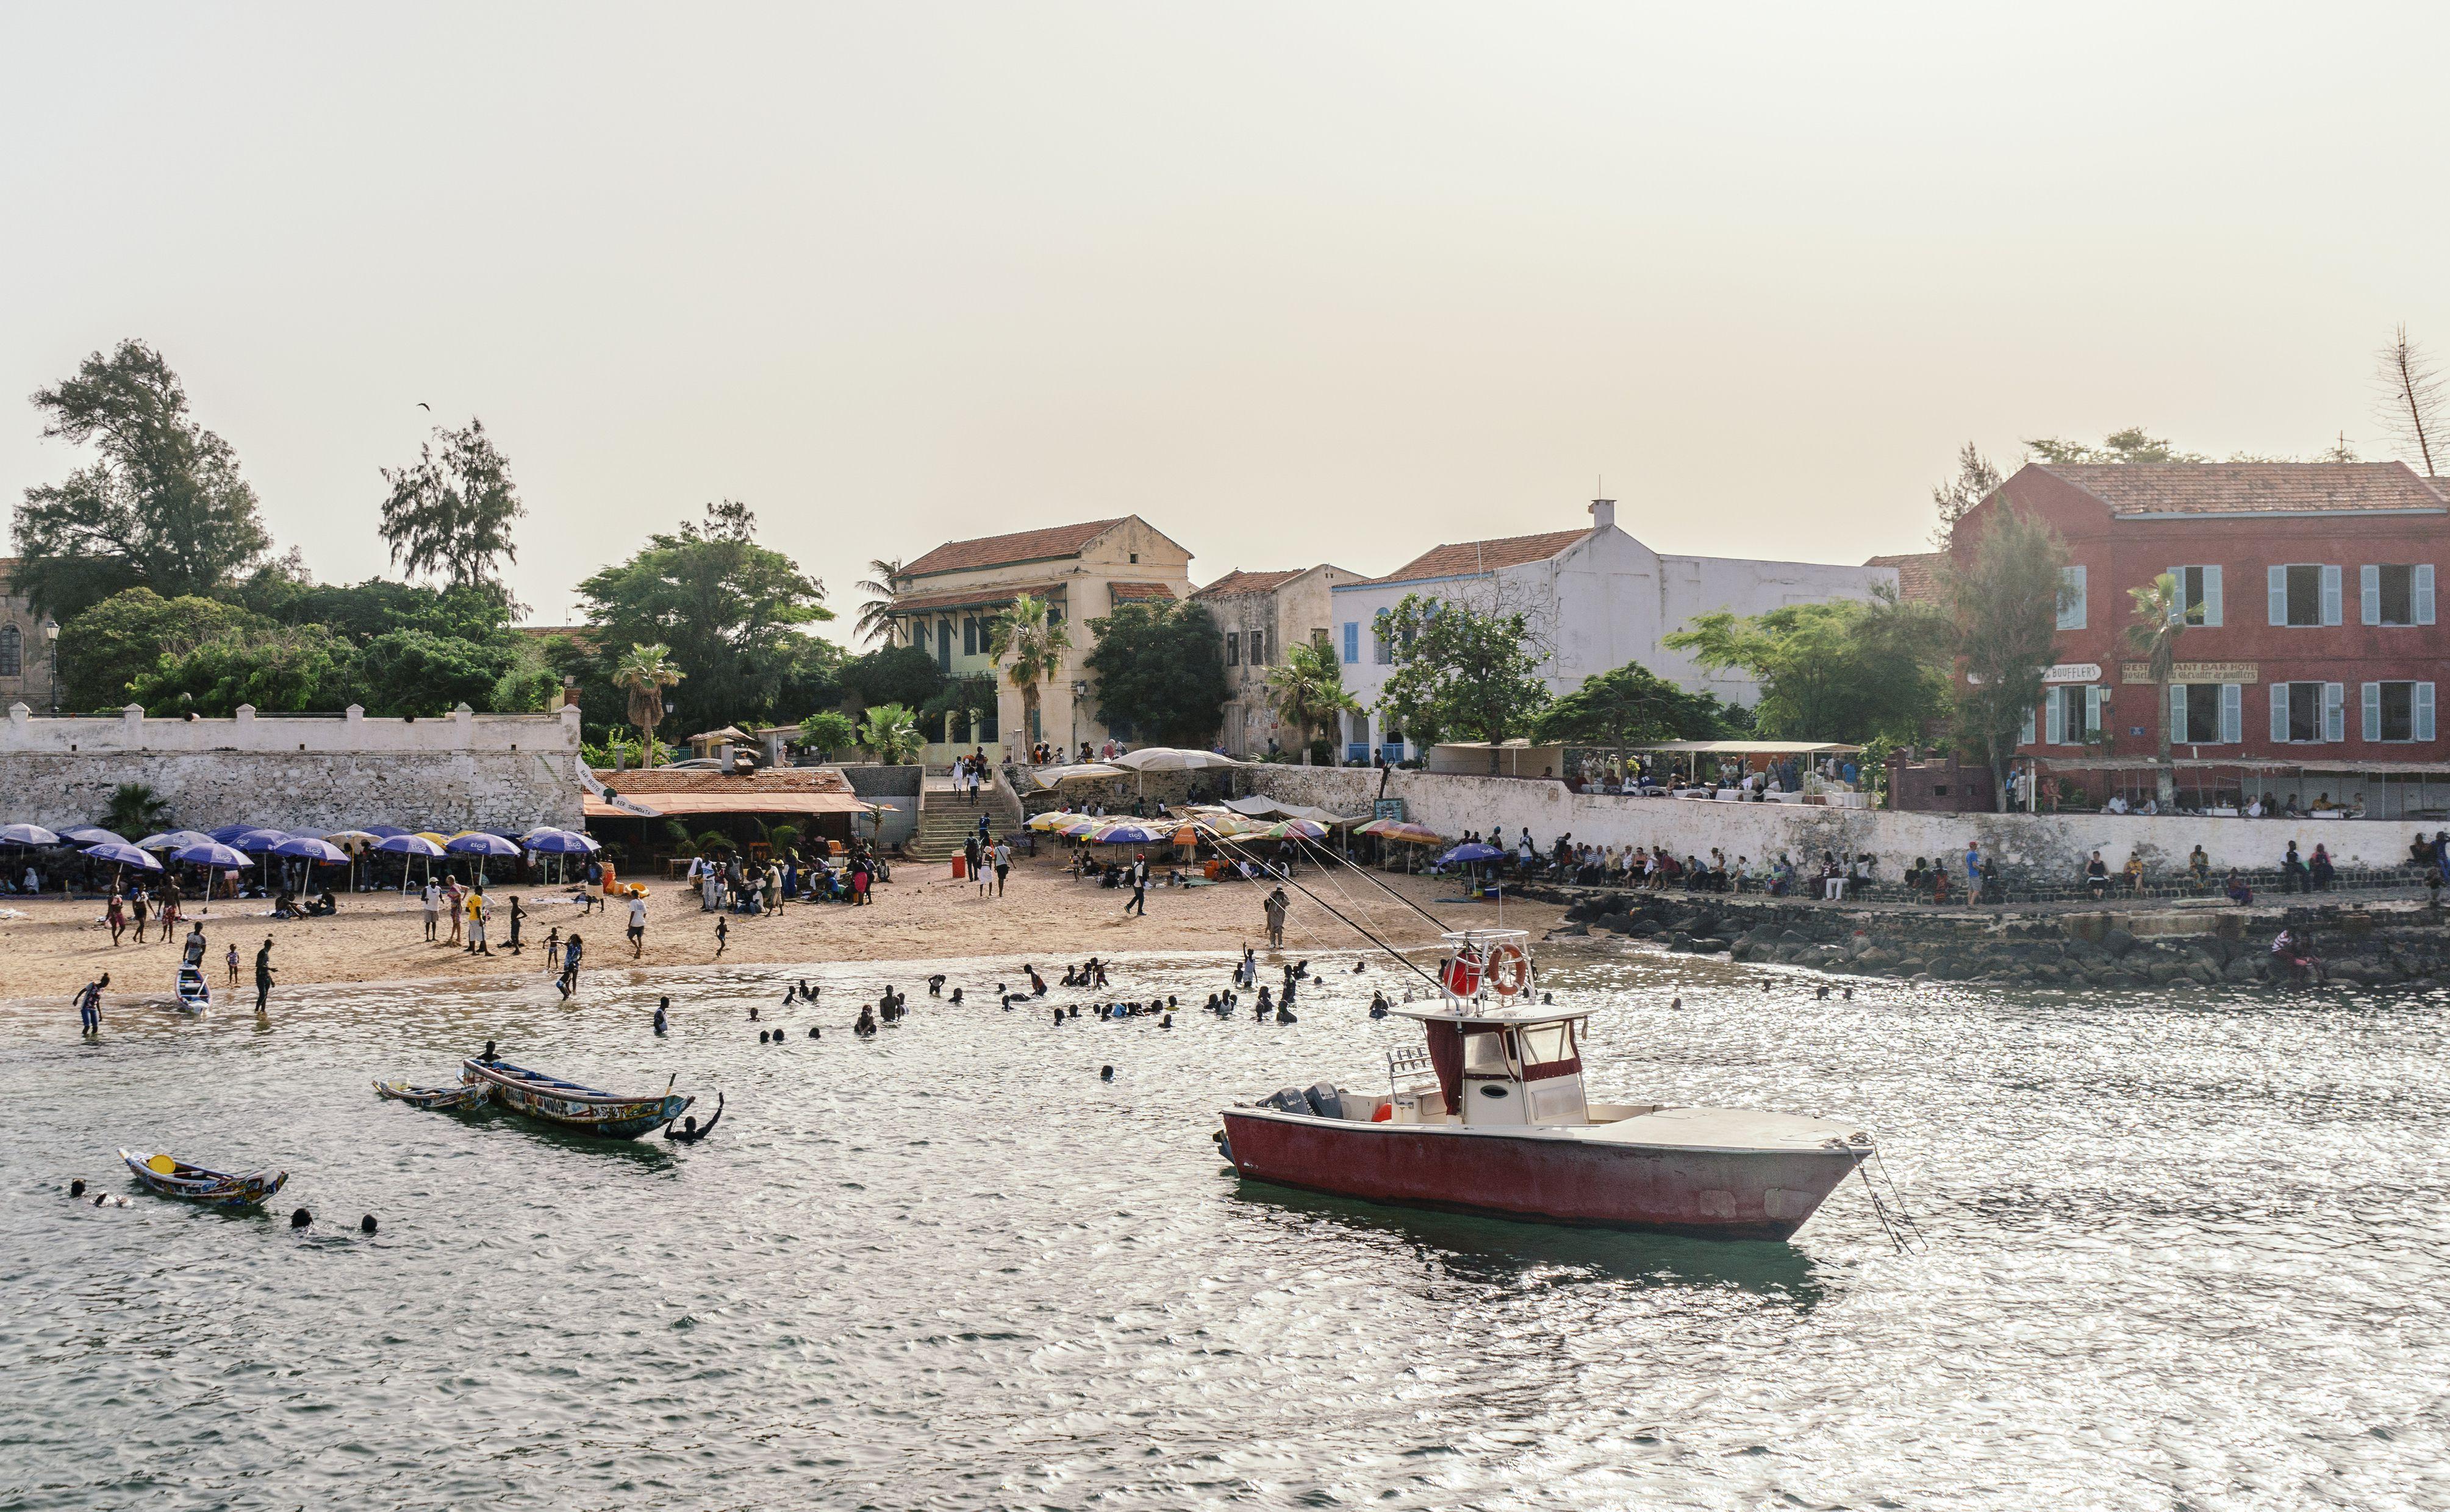 Goree Island, Dakar, Senegal